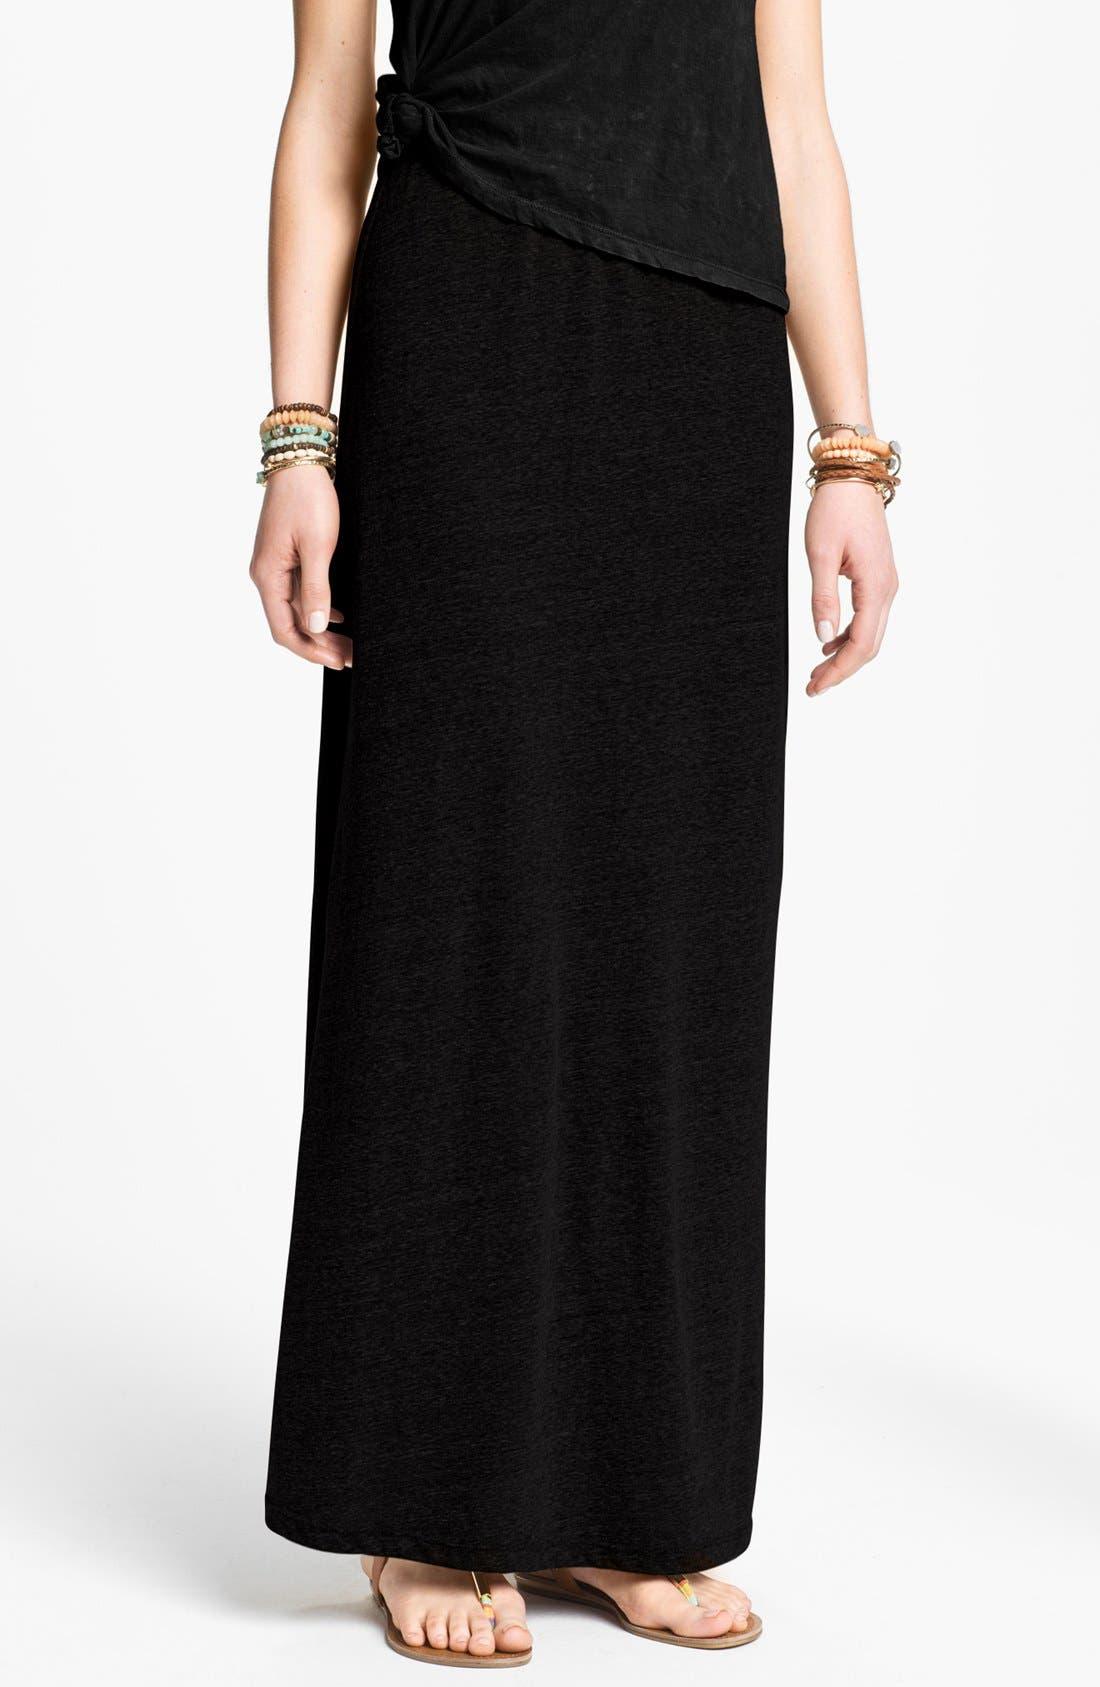 Alternate Image 1 Selected - h.i.p. Tri-Blend Knit Maxi Skirt (Juniors)